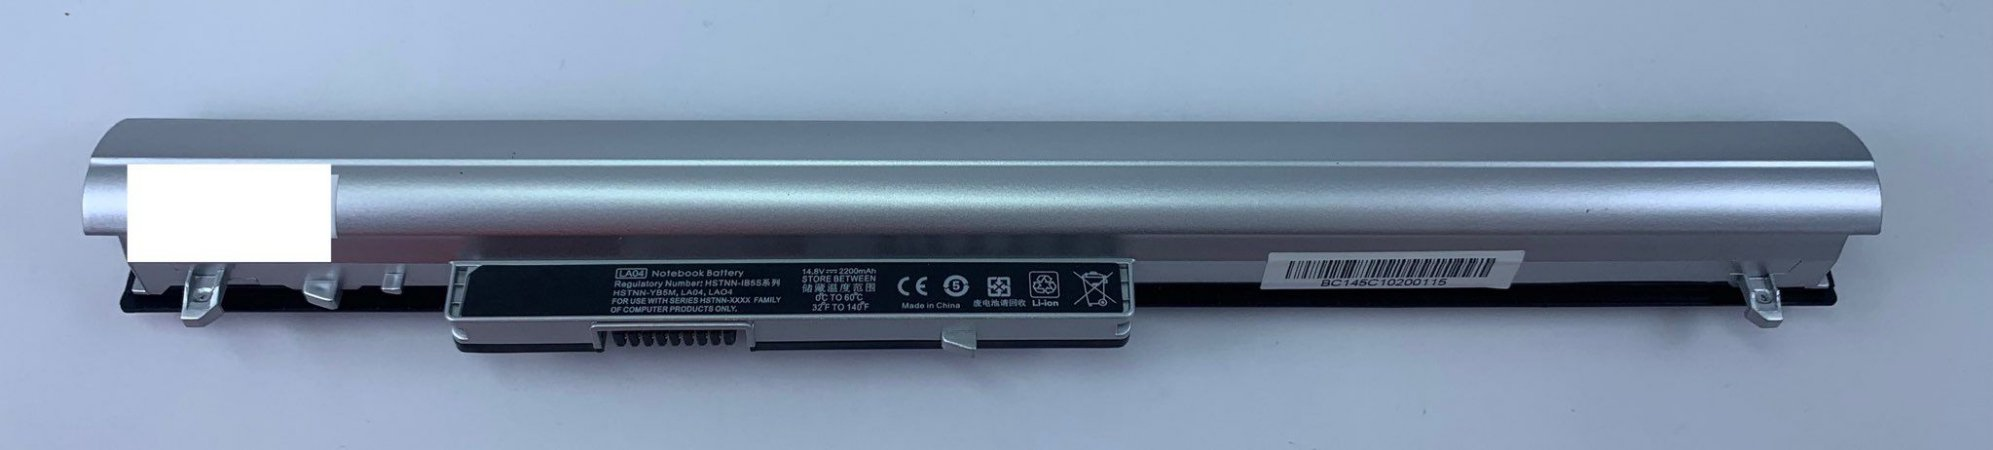 BATERIA PARA NOTEBOOK HP 740715-001 HSTNN-LB5S ( PRATA )